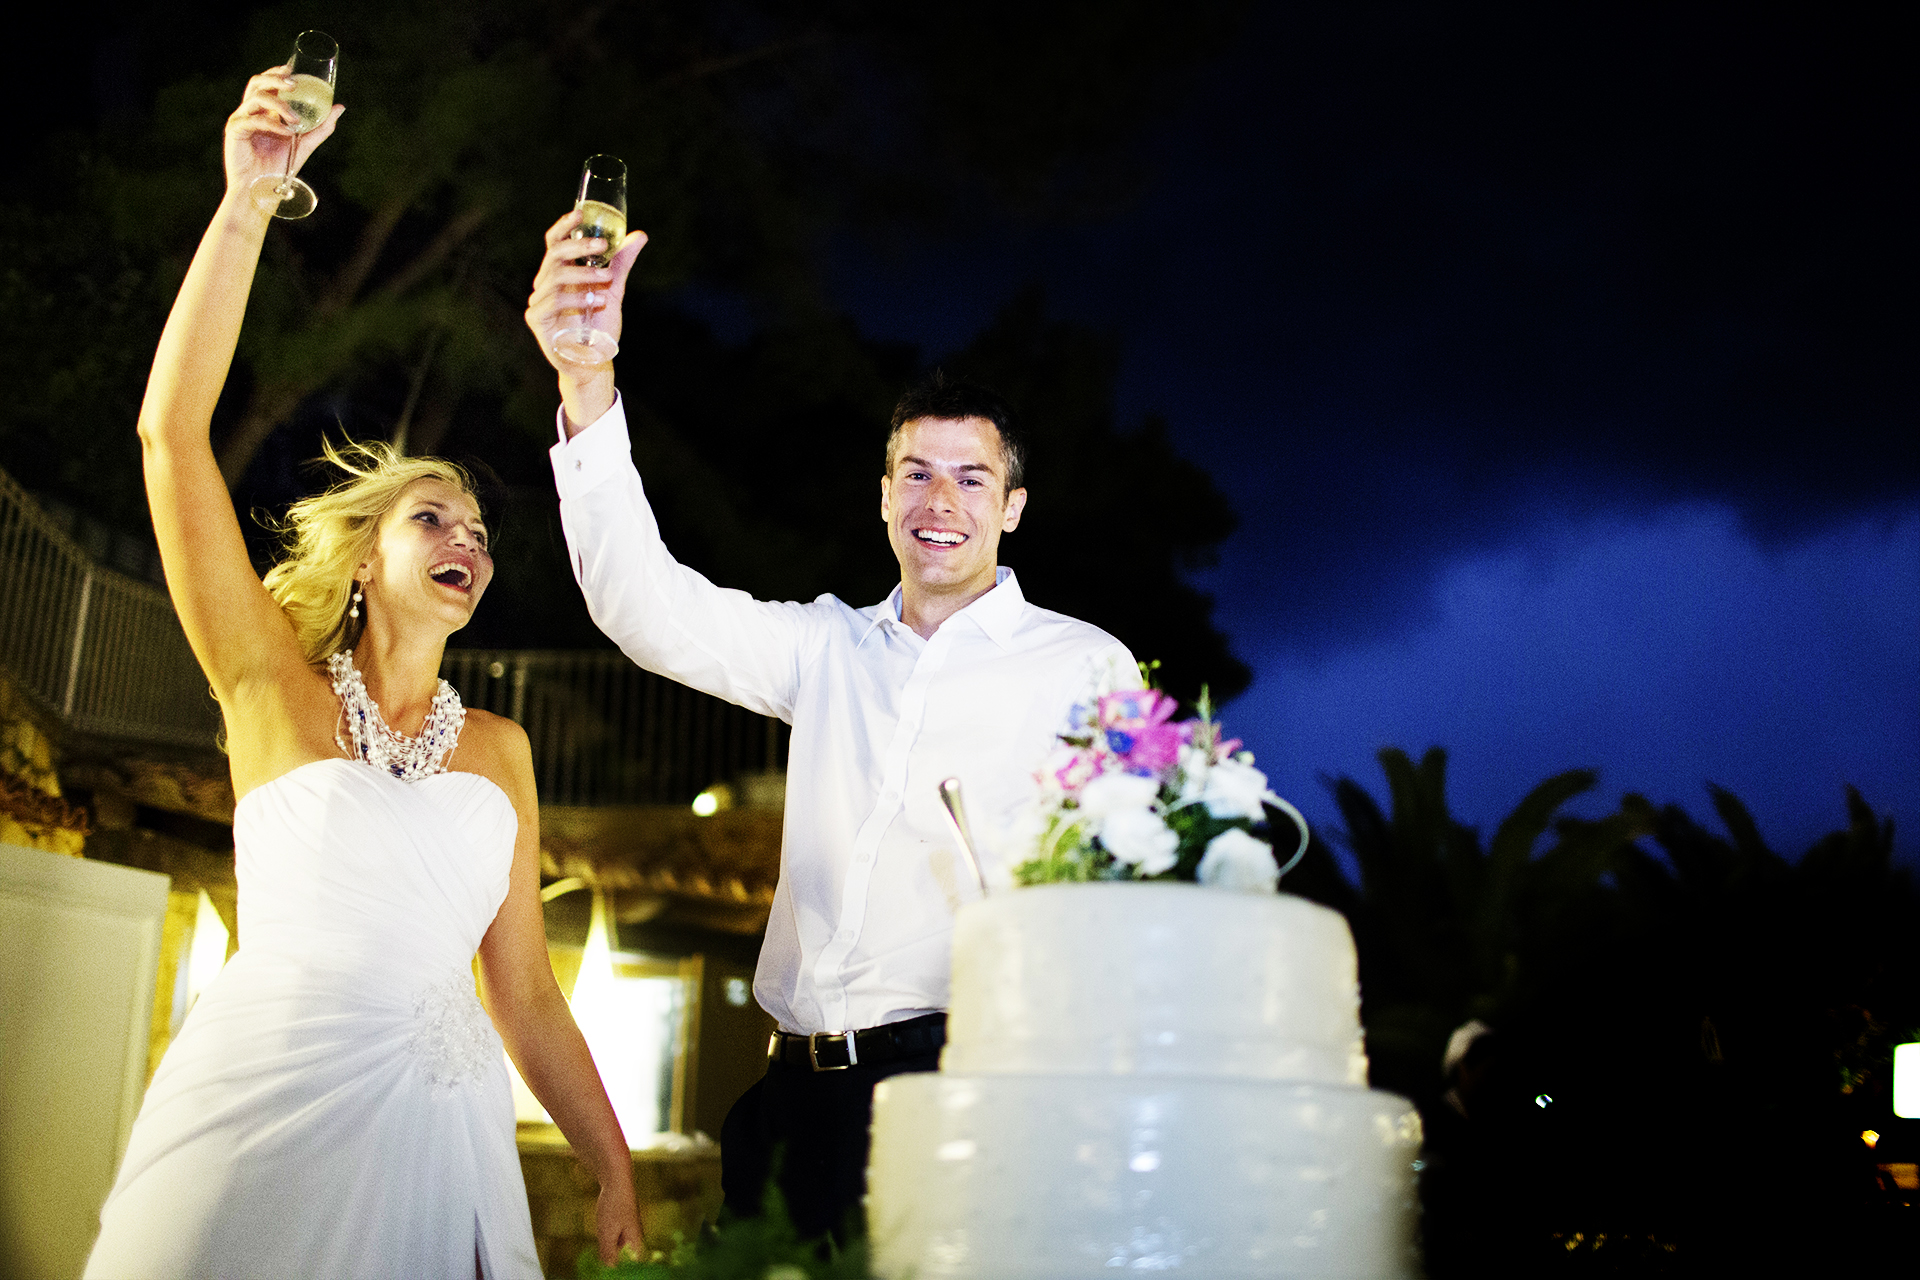 Italy Wedding Reportage Photographer |